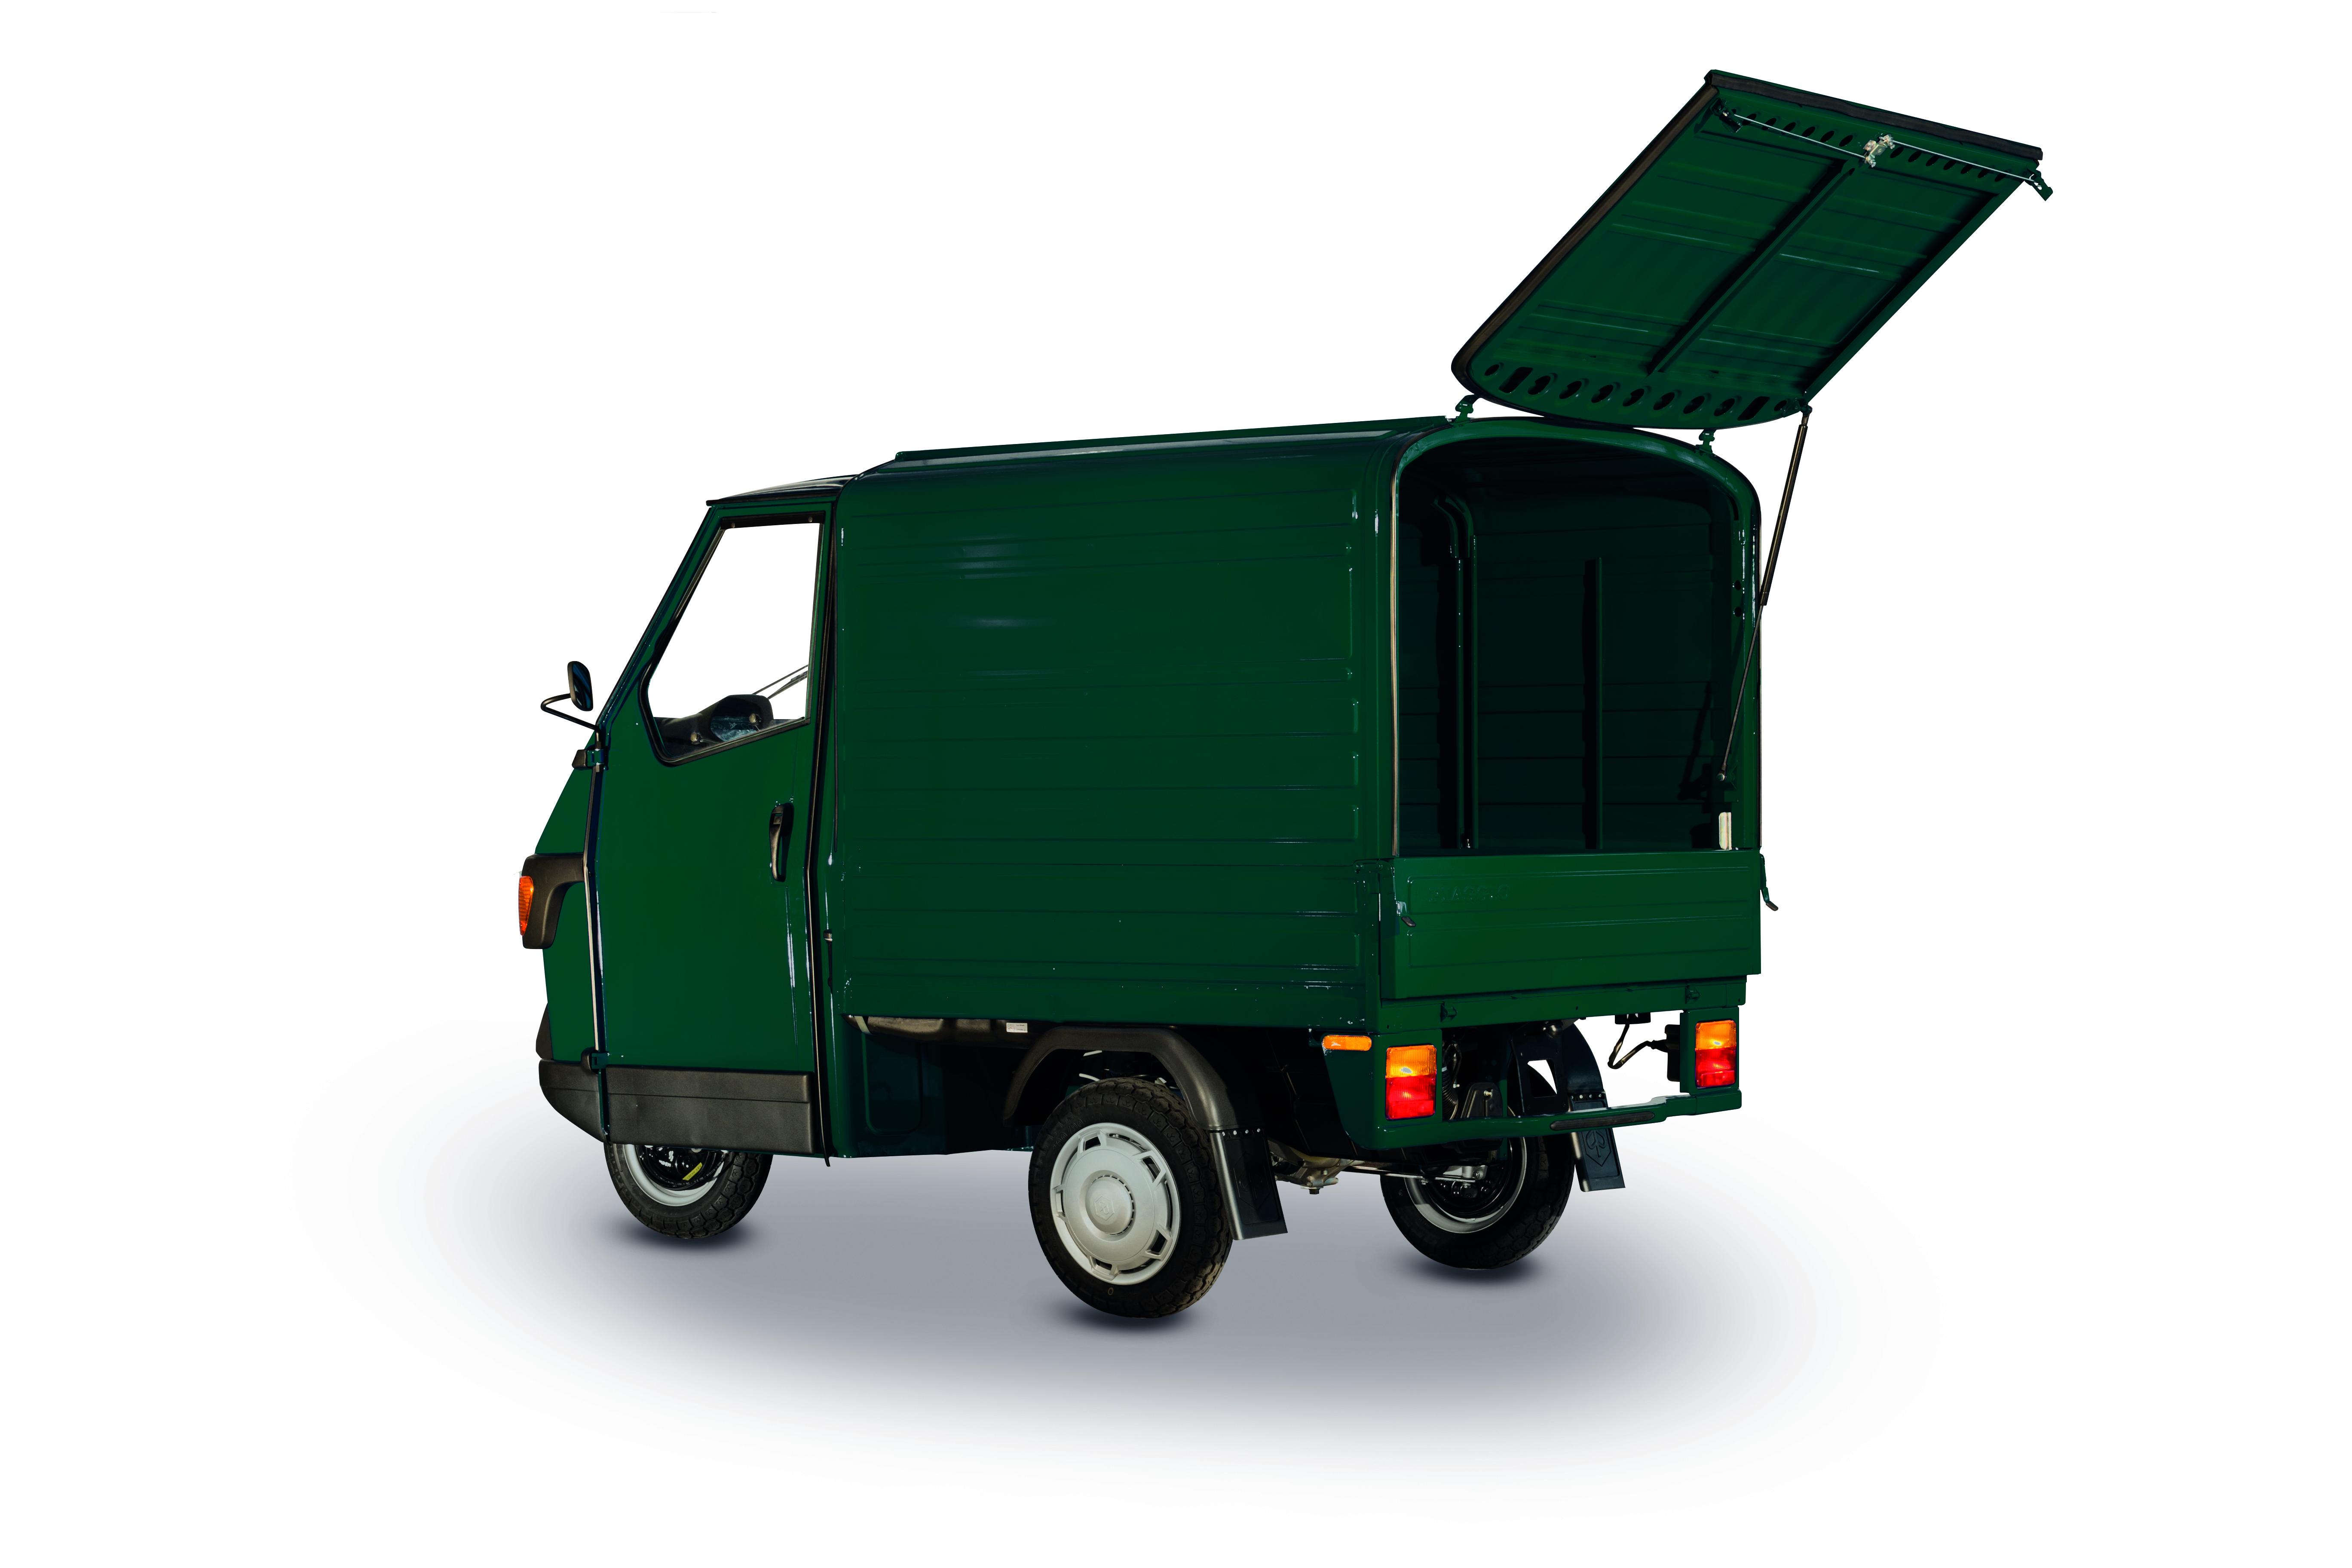 Furgonato Verde Sherwood.jpg